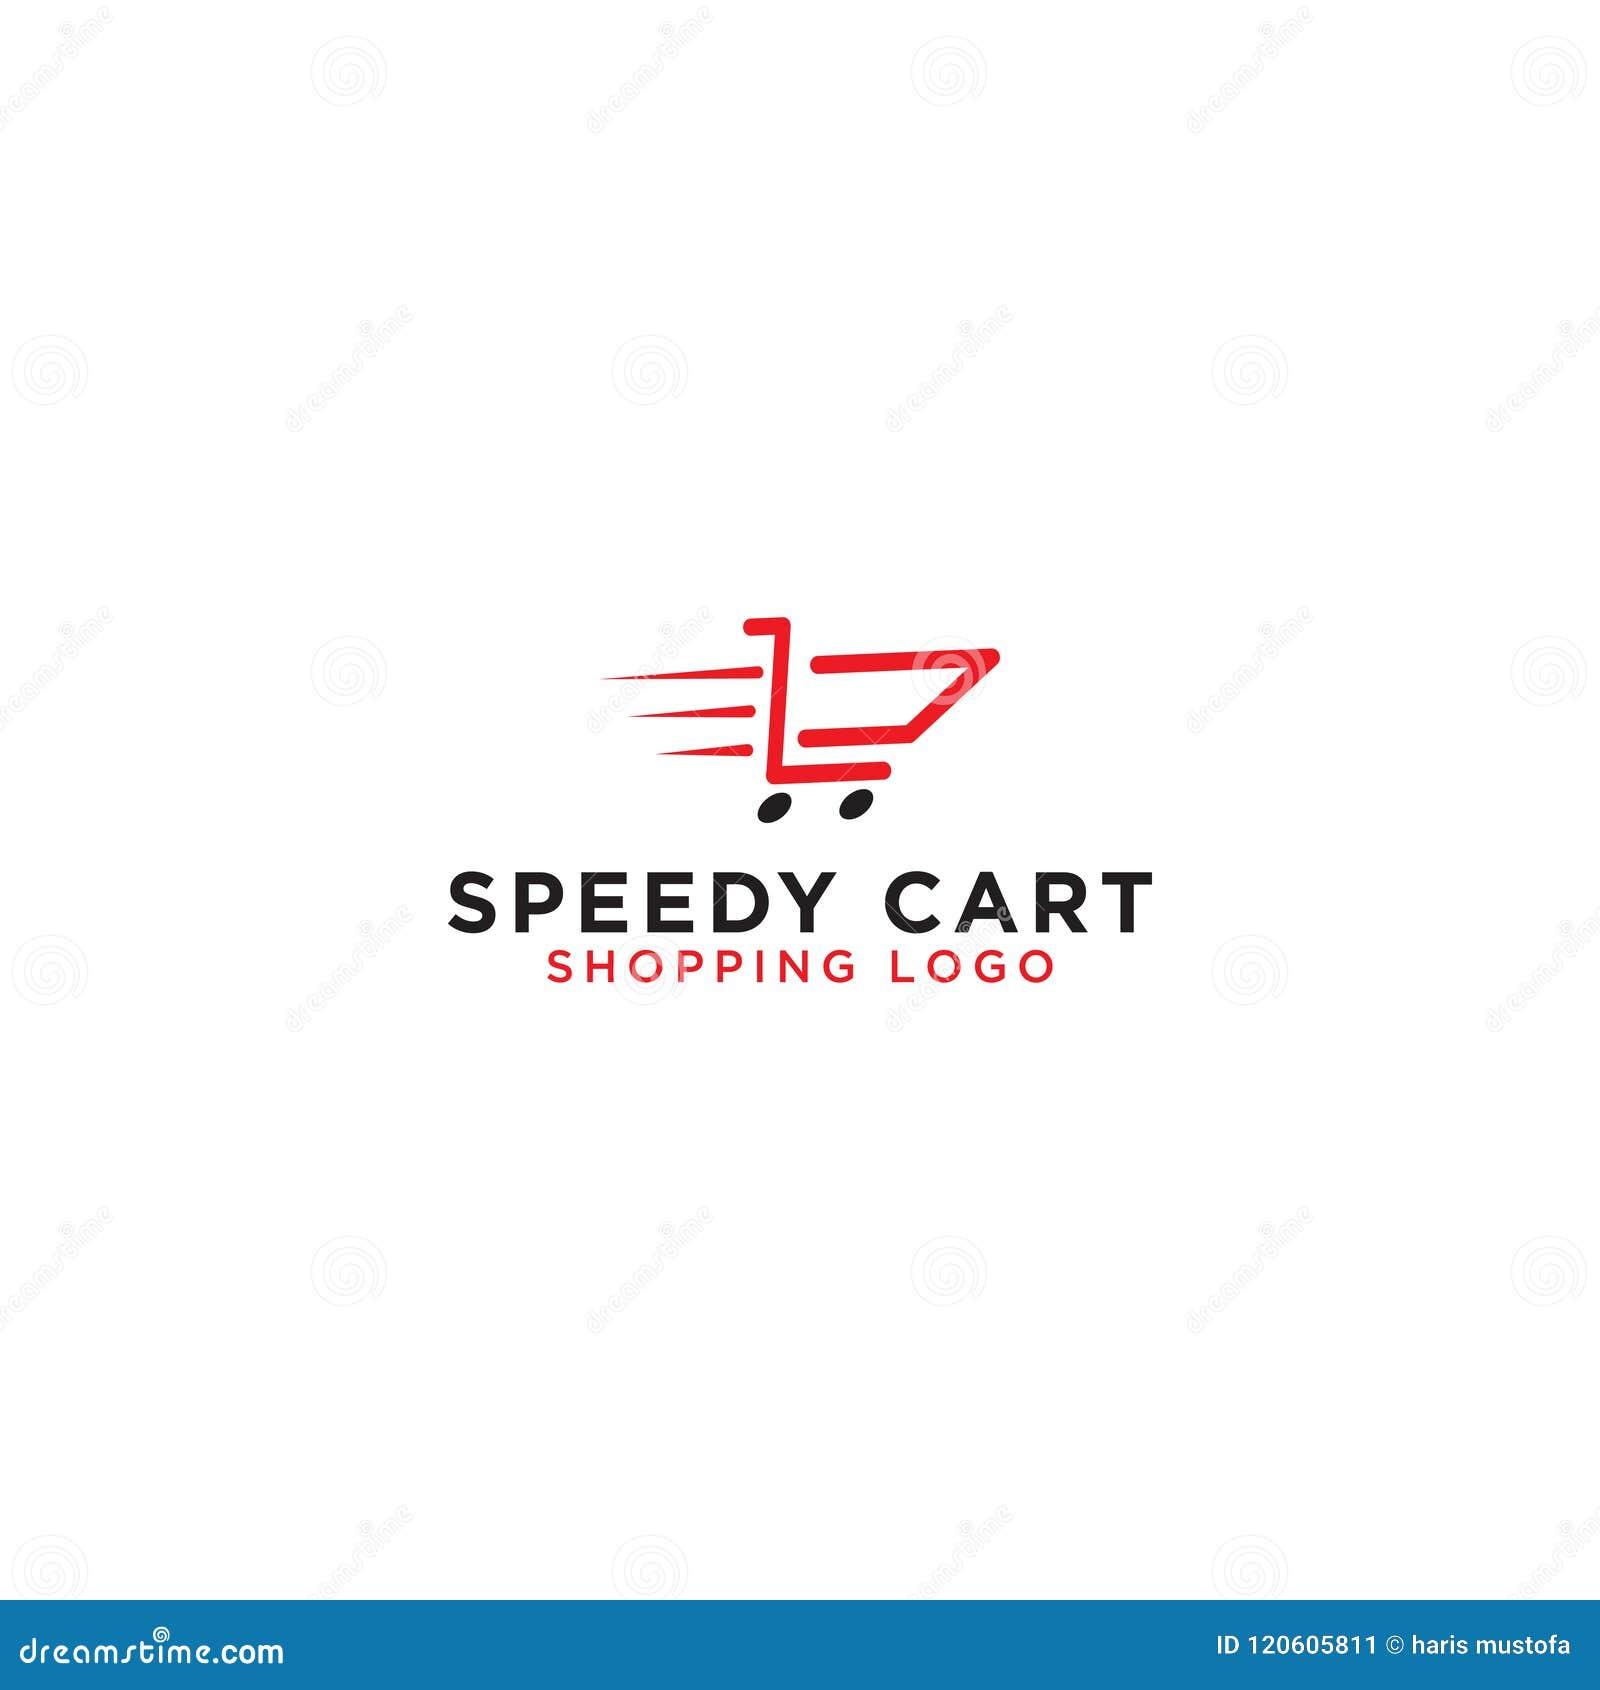 purchase logo template  Shopping Cart Logo Design Template Stock Vector - Illustration of ...